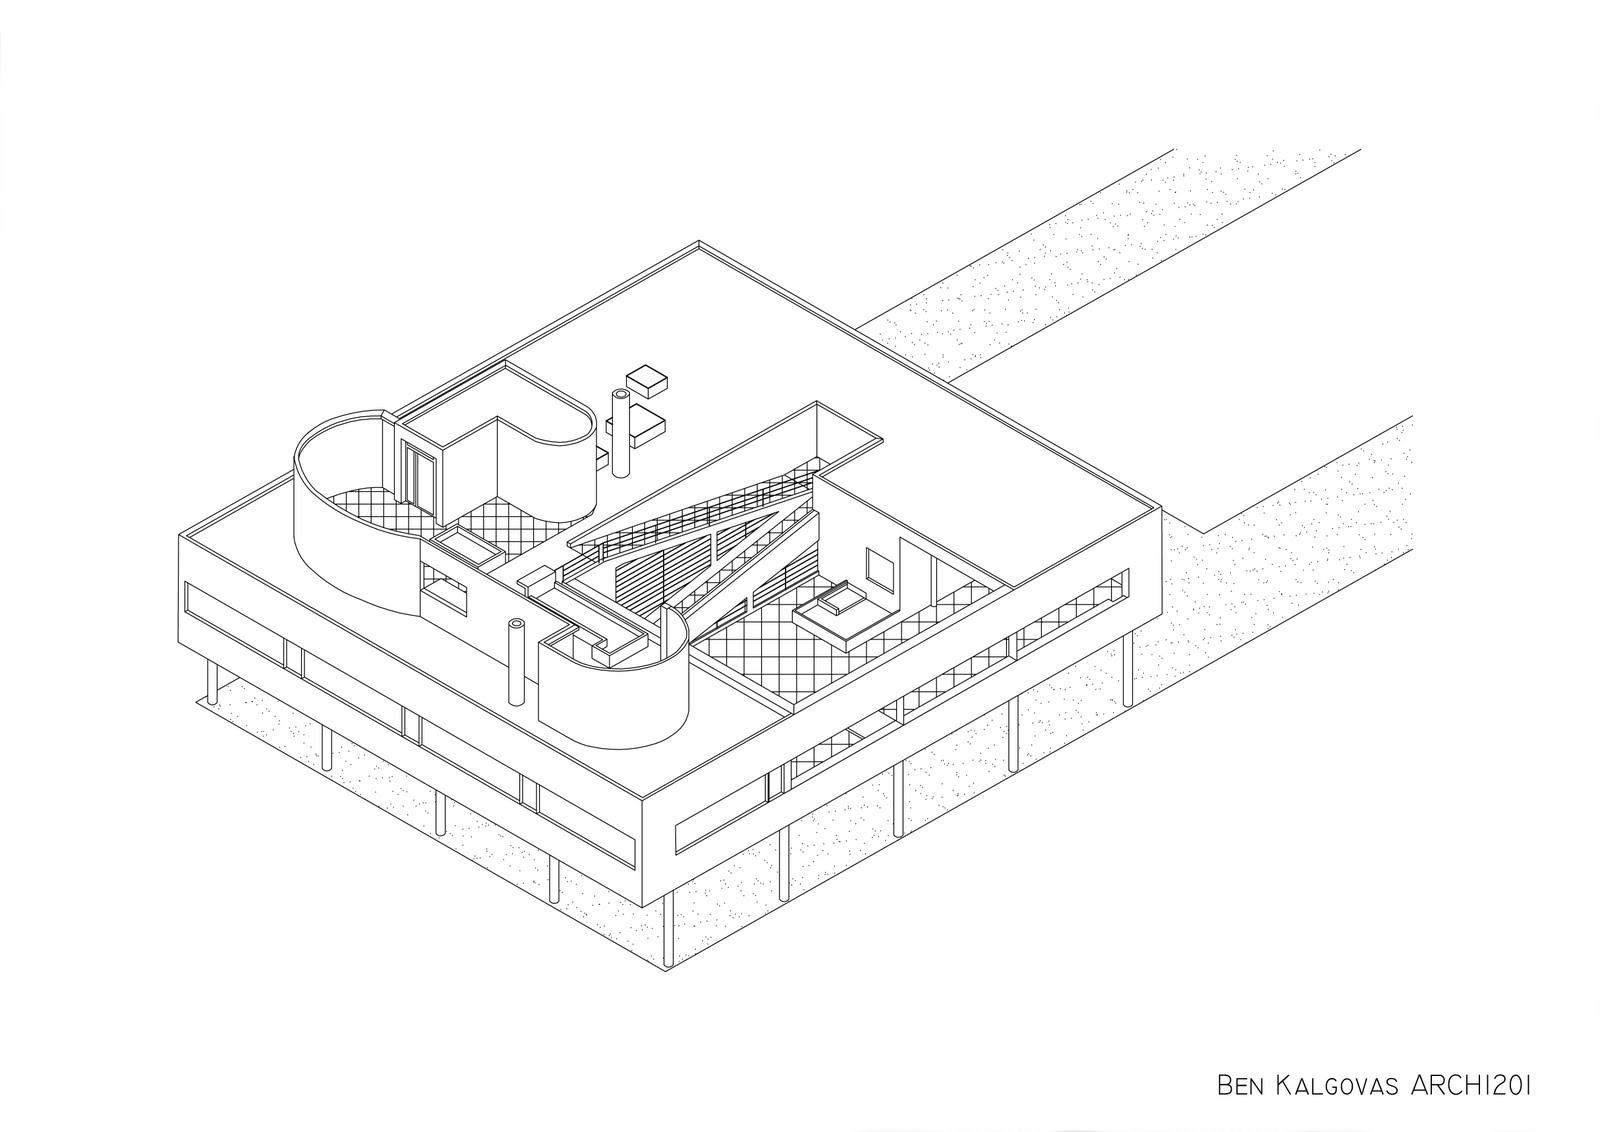 Garden design drawing - Arch 1201 Design Studio 3 Project 1 Villa Savoye Drawings